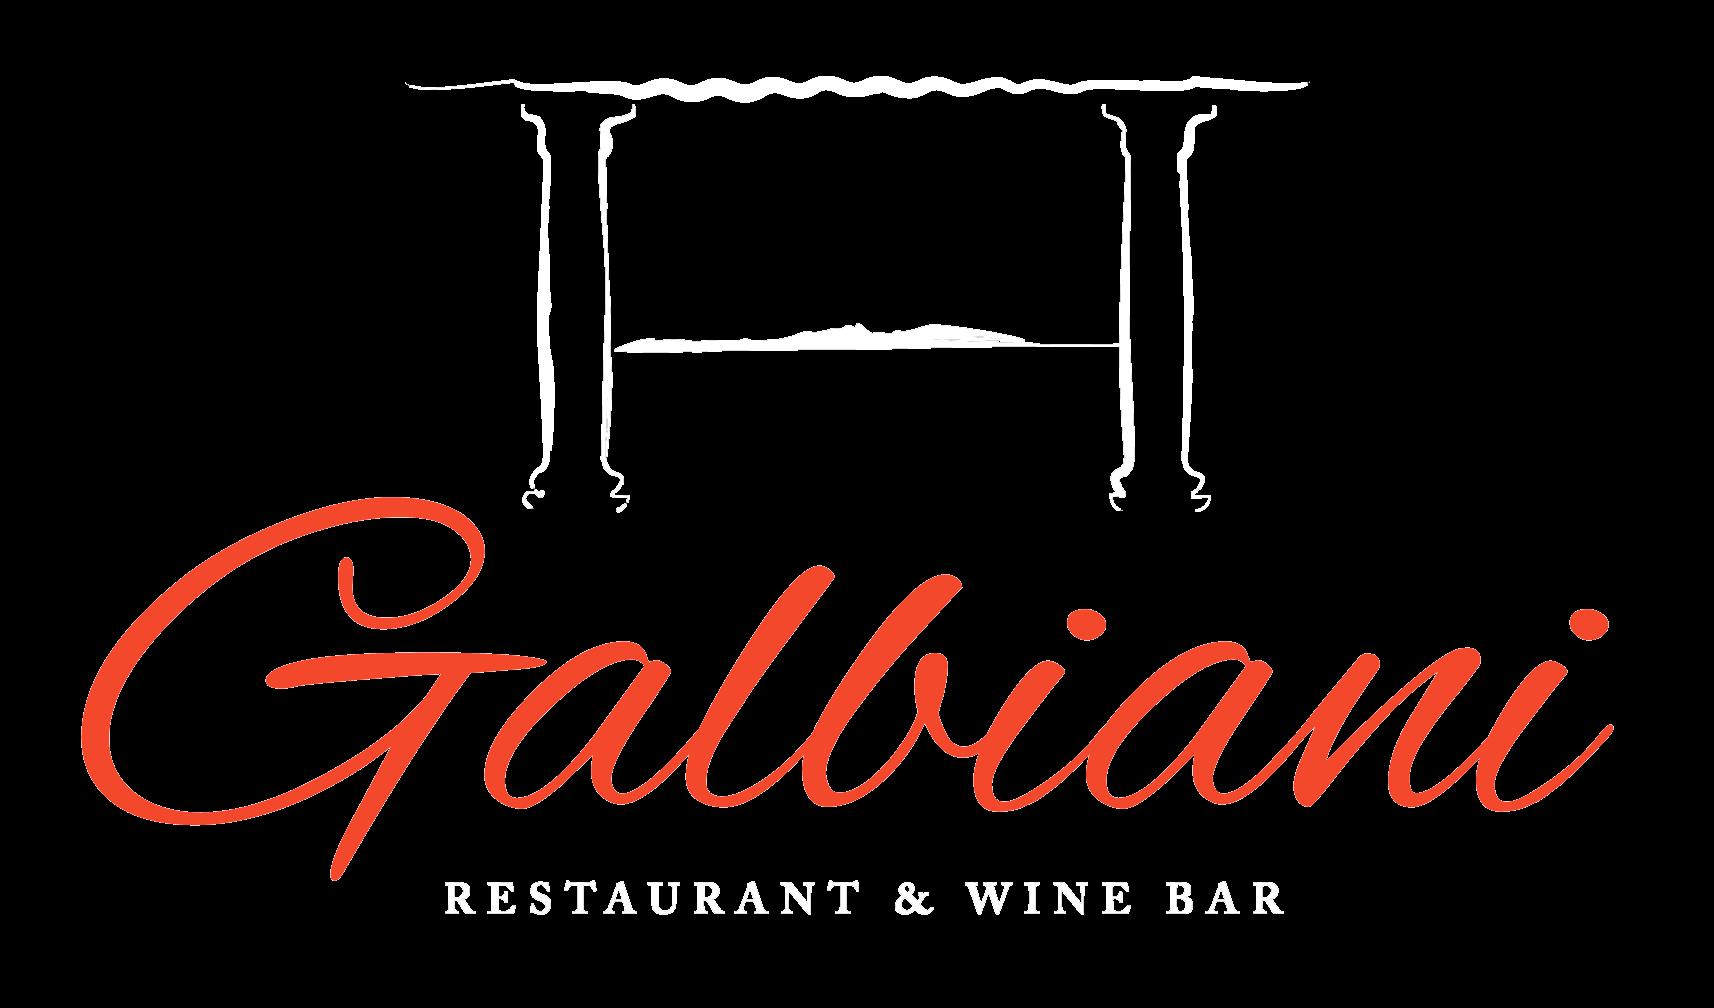 Restaurant Galbiani